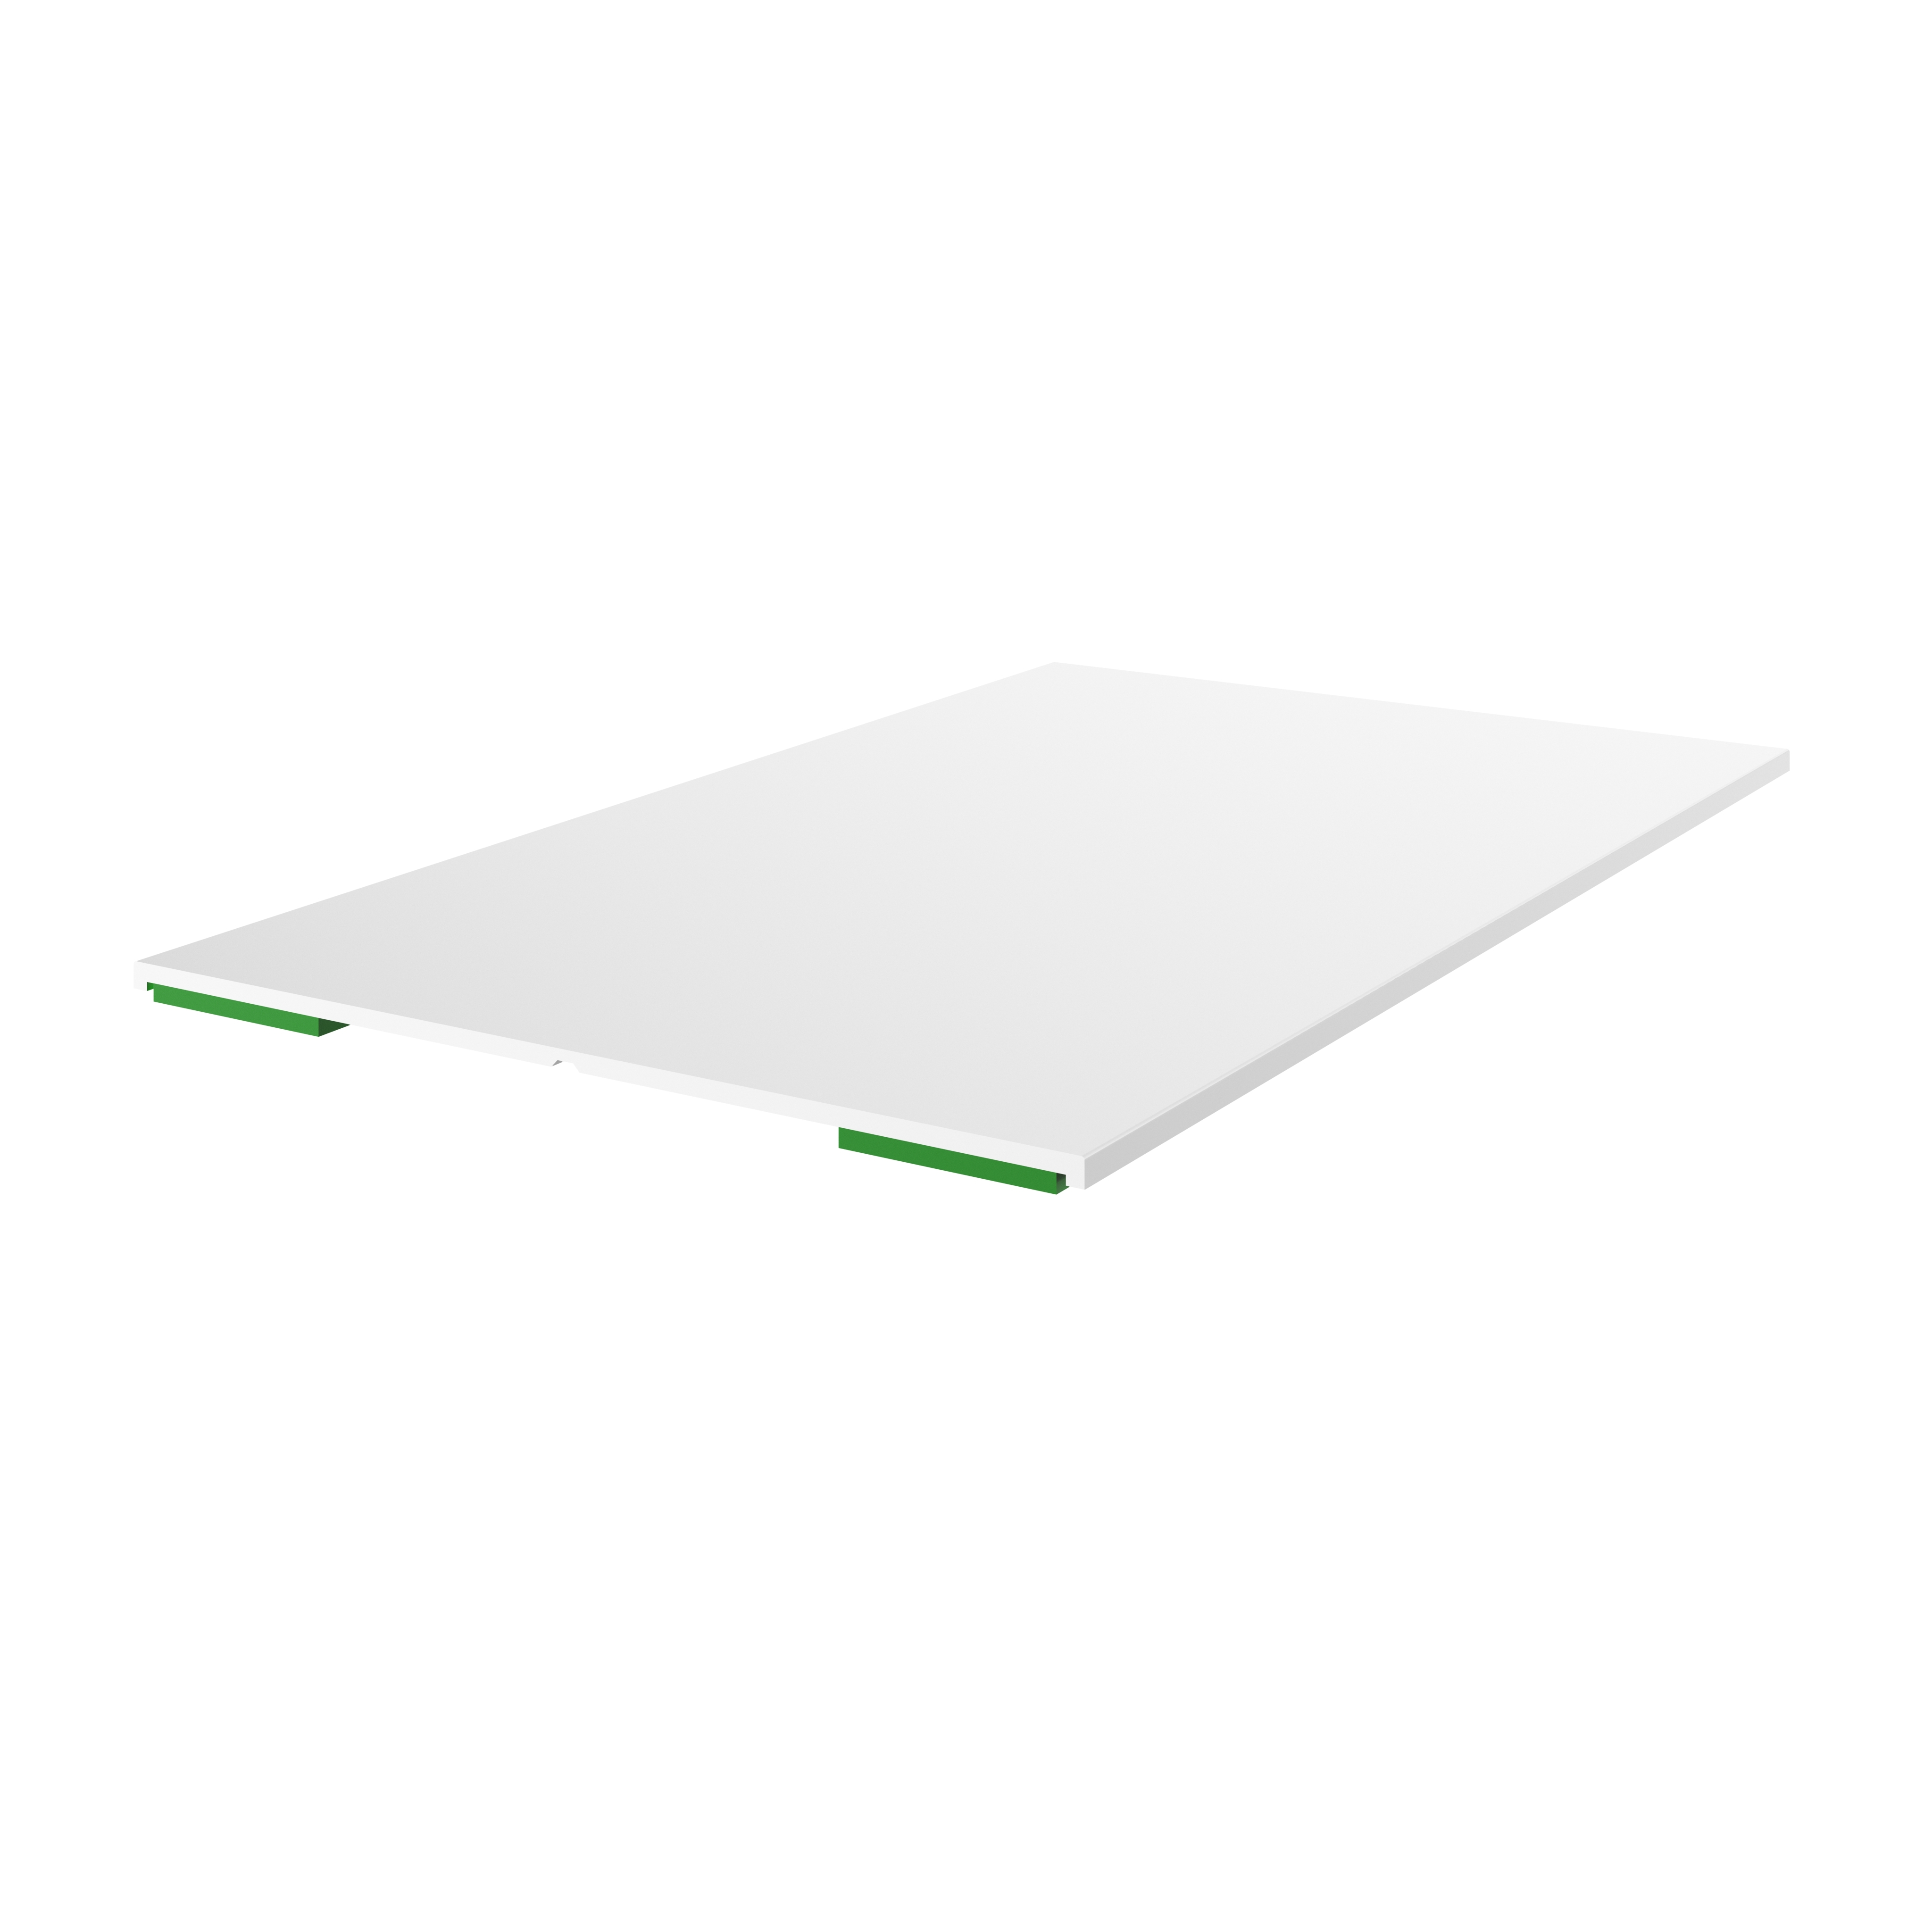 """0,98€/m"" 10m Winkel Winkelleisten Leiste Kunststoffleiste PVC-Leiste 15x15 mm"